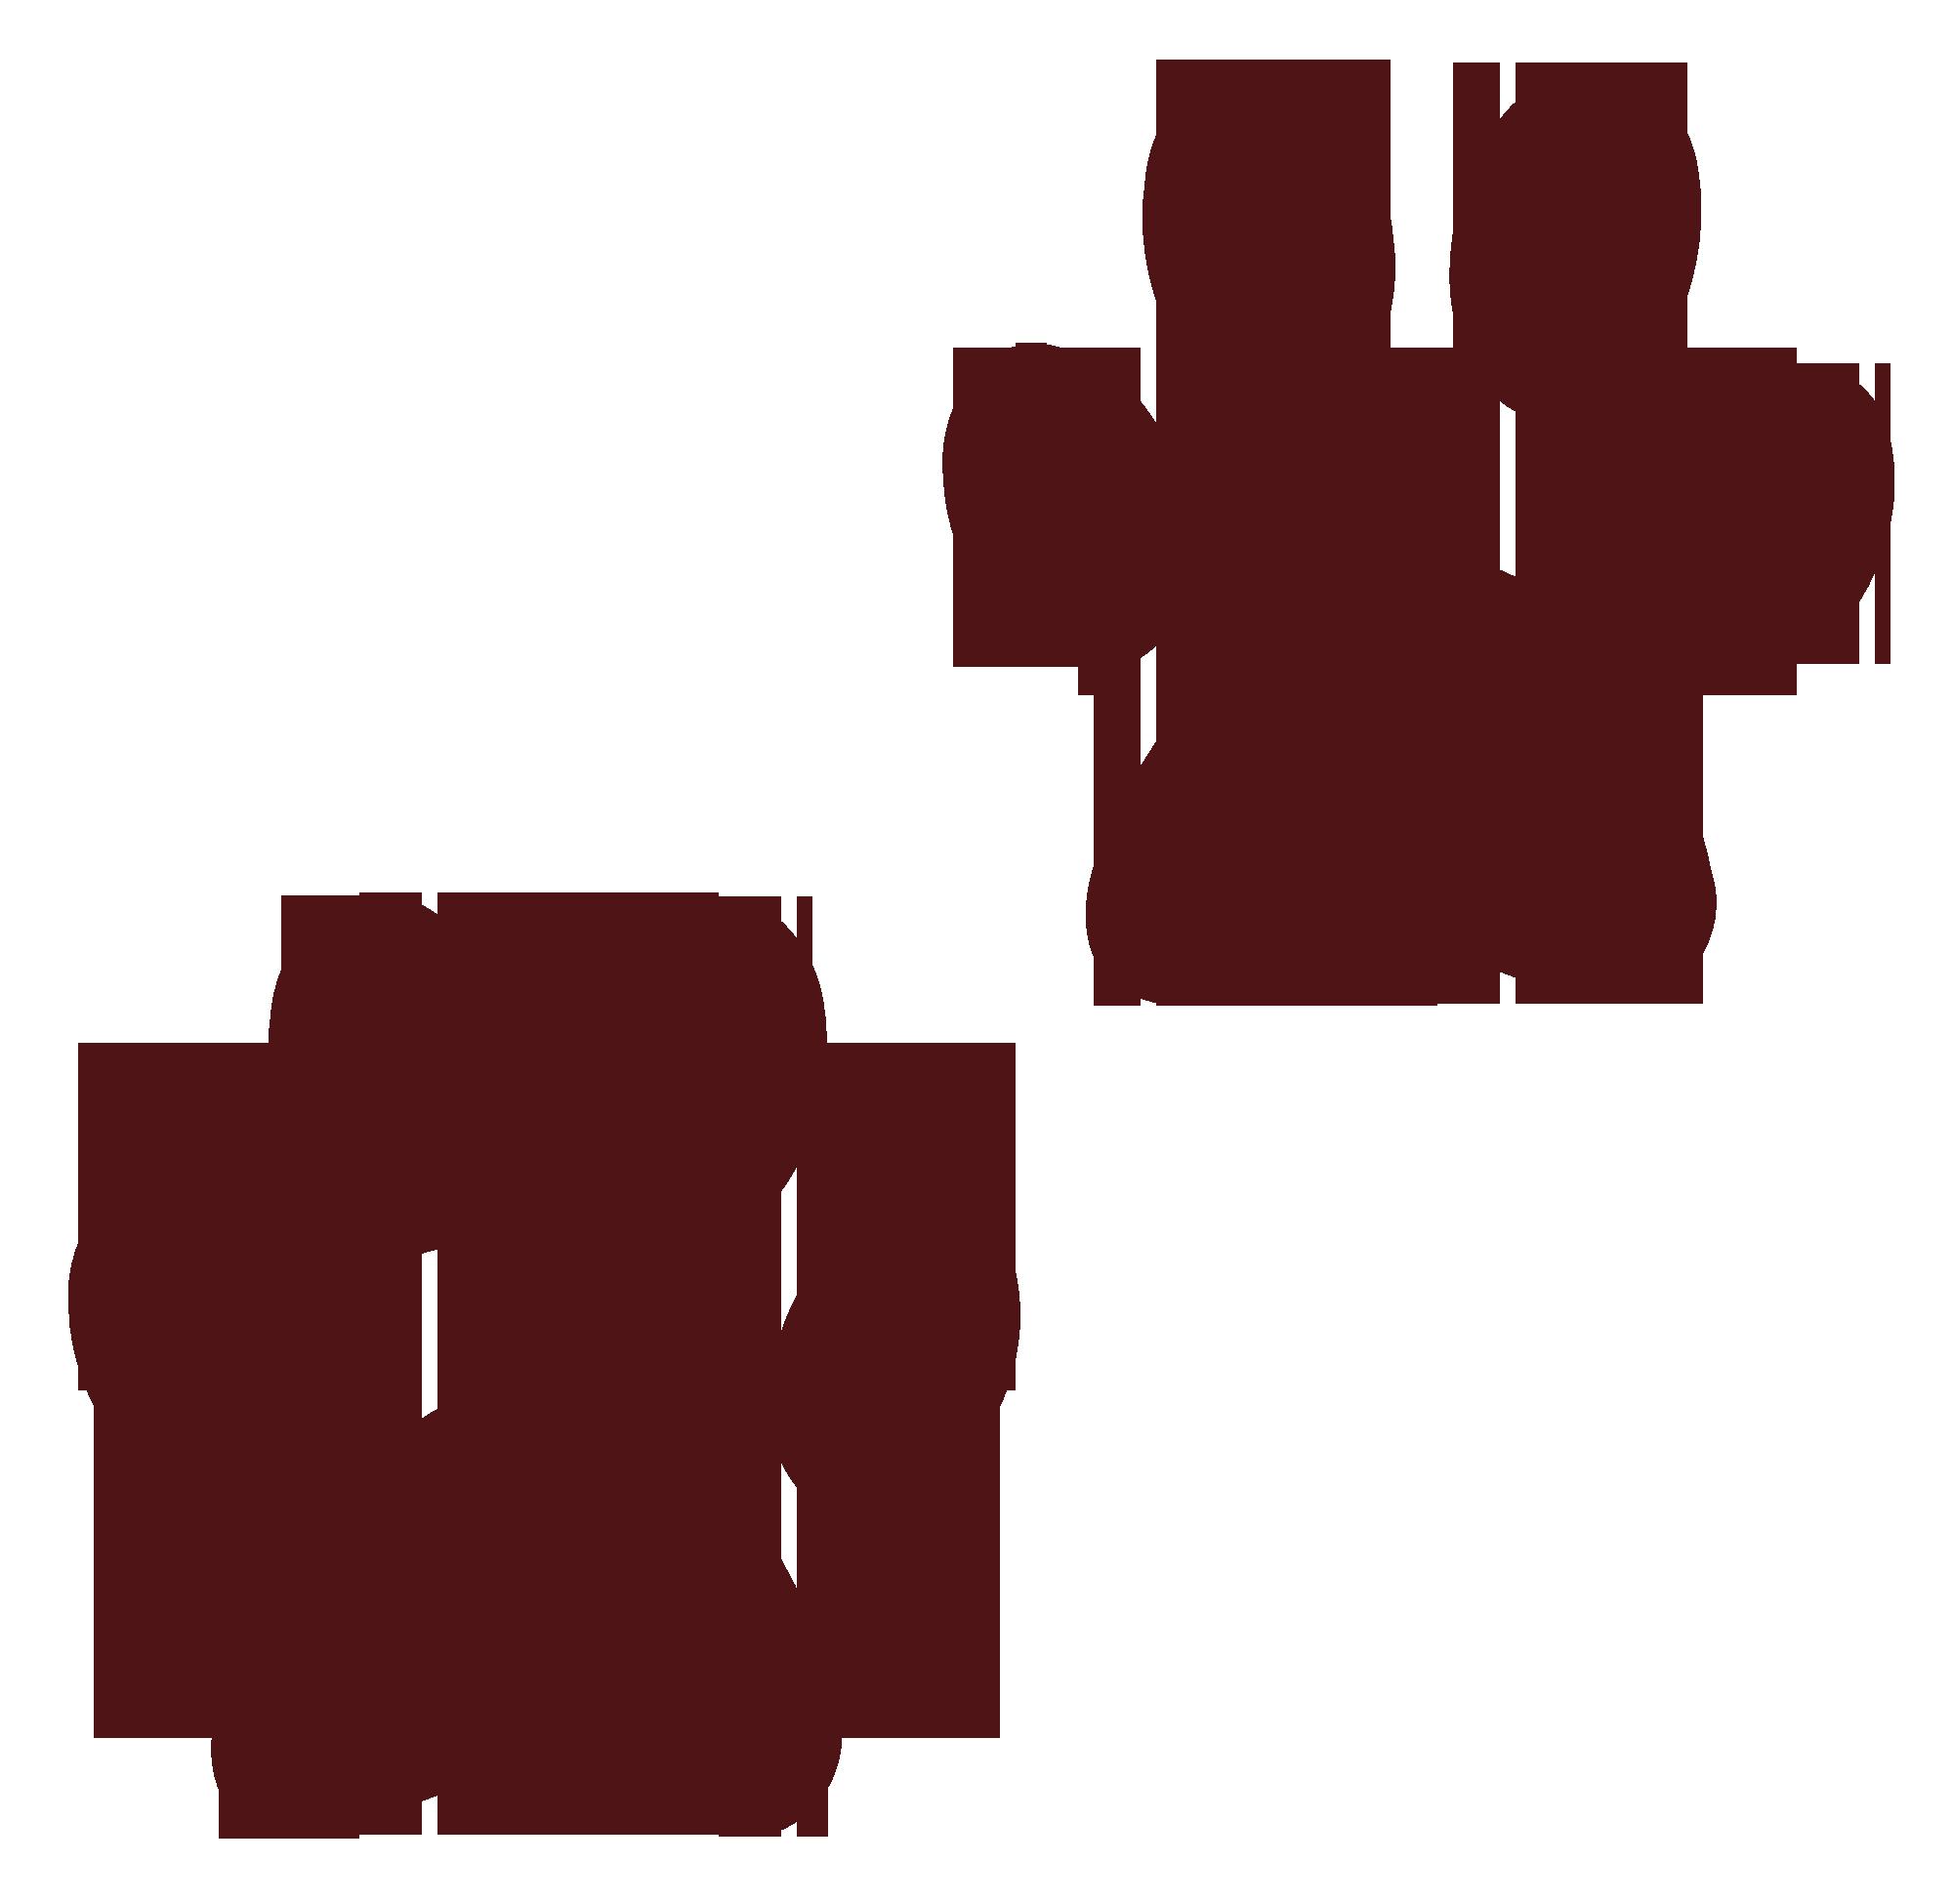 dog paw print png image purepng free transparent cc0 png image